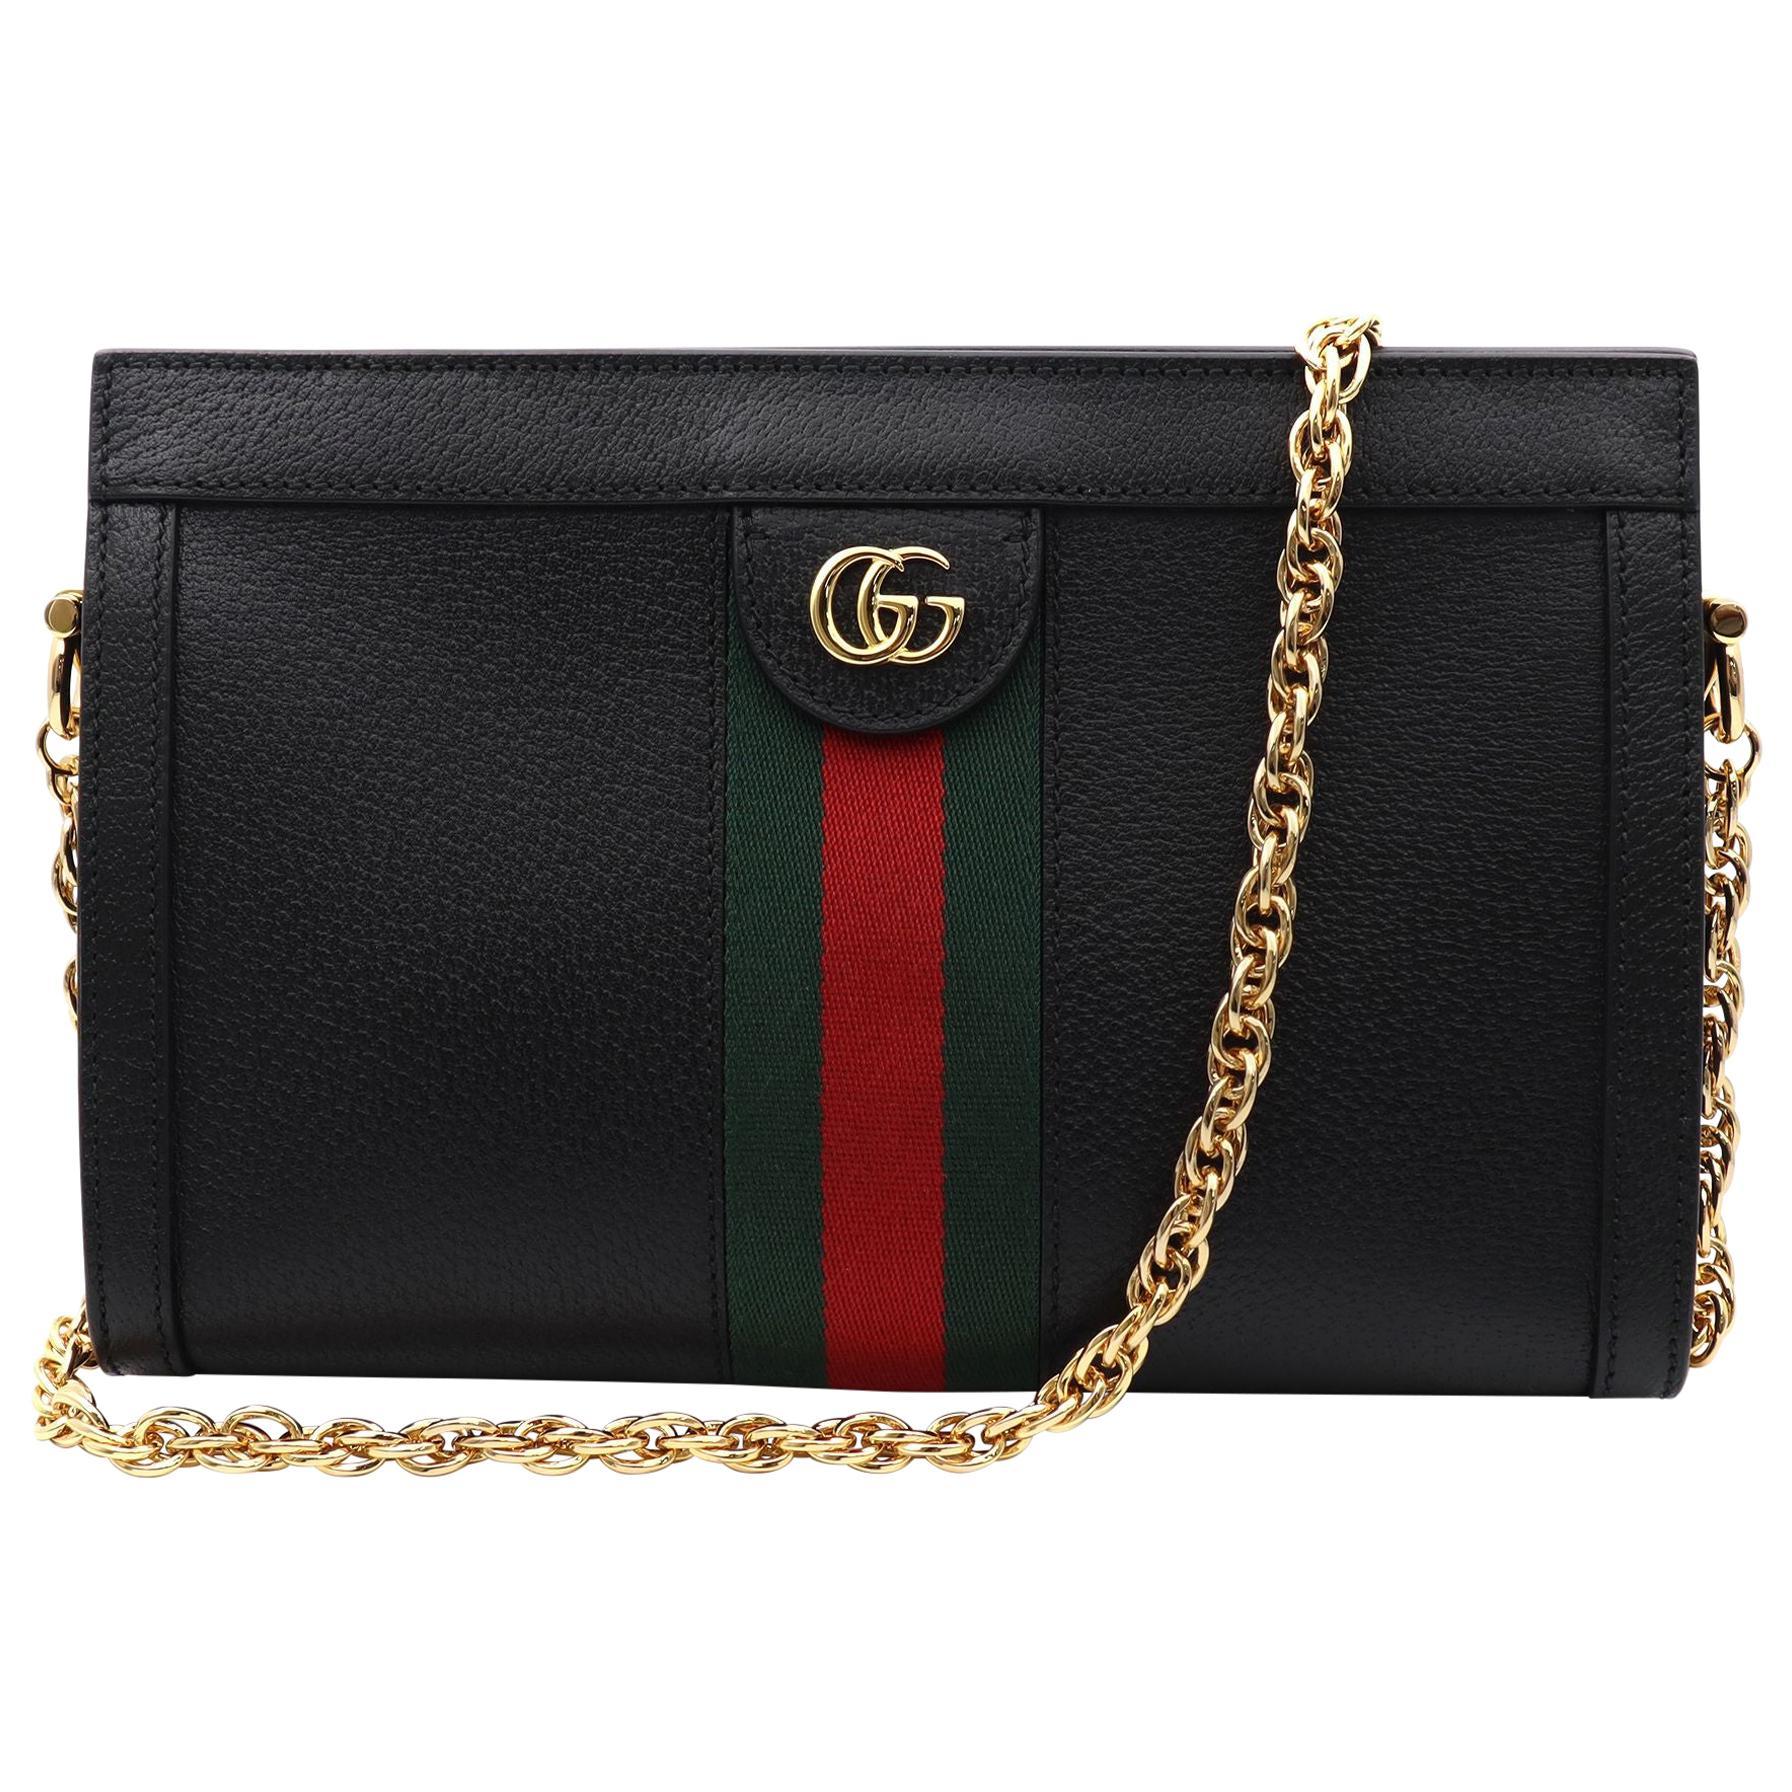 Gucci Ophidia Small Leather Women's Shoulder Bag 503877 DJ2DG 1060